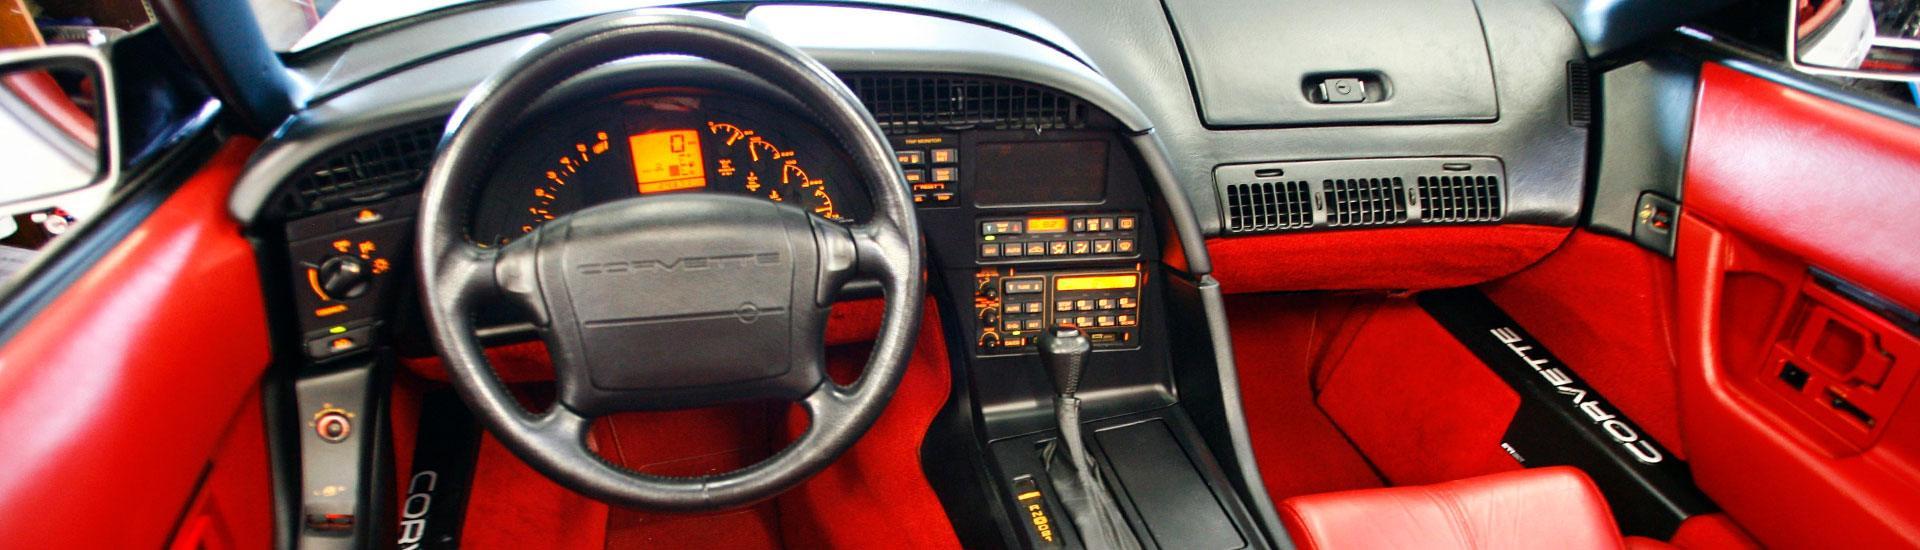 1995 Chevrolet Corvette Dash Kits Custom 1995 Chevrolet